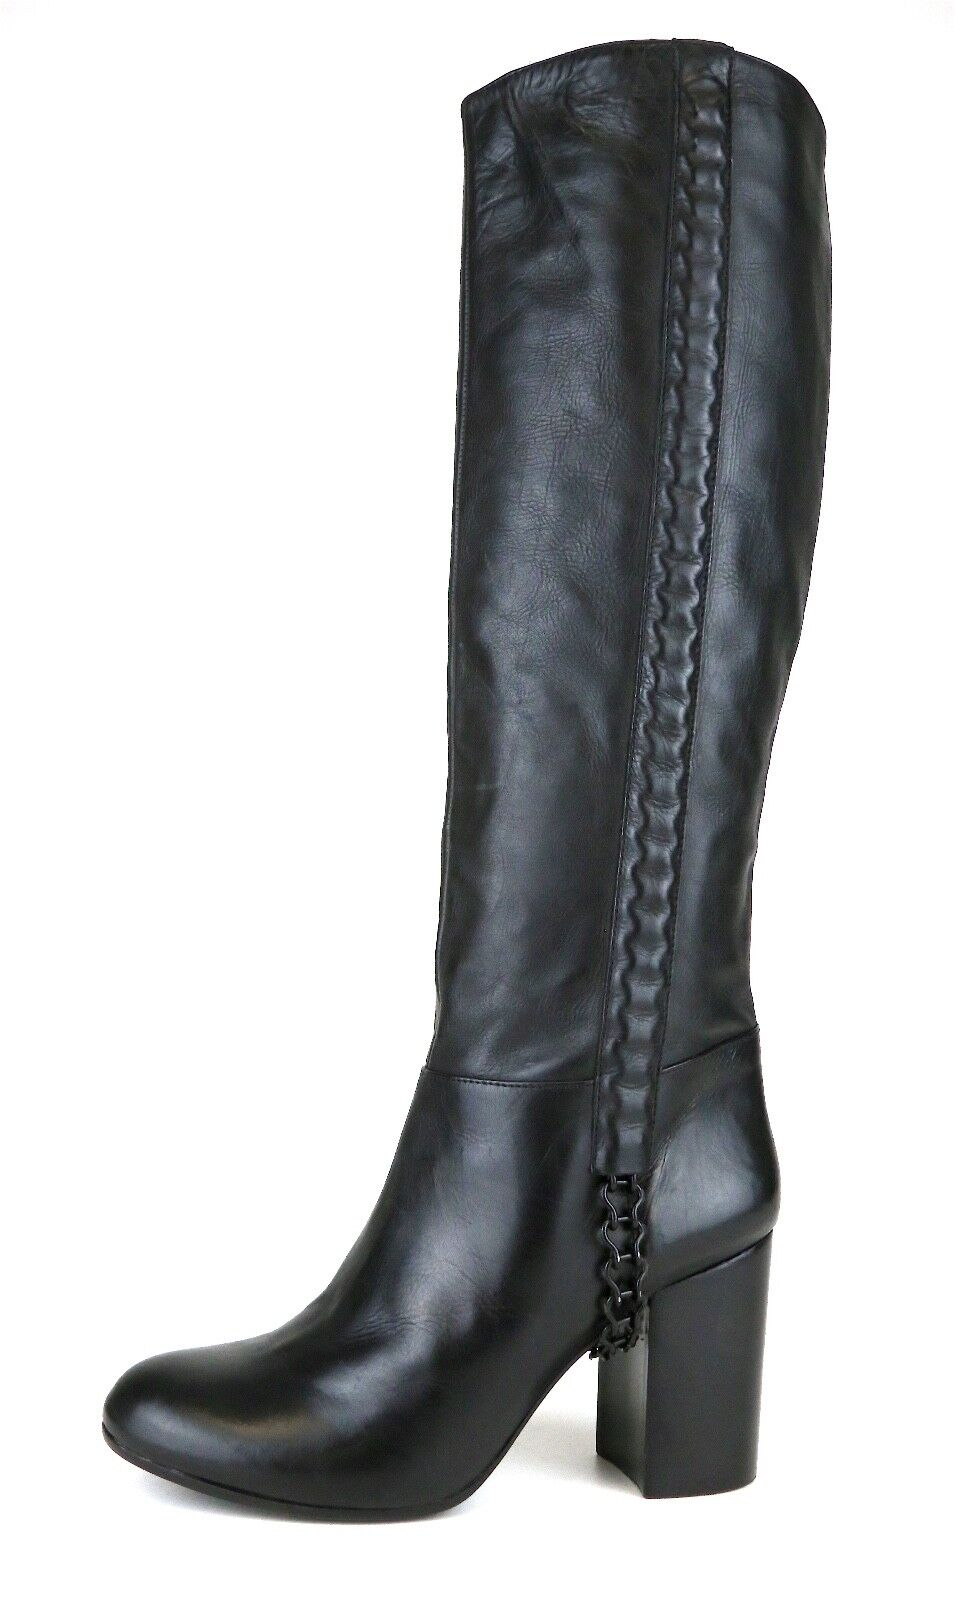 Vince Camuto Signature Kisha High Pelle Boot Nero Donna Sz 6.5 M 5222